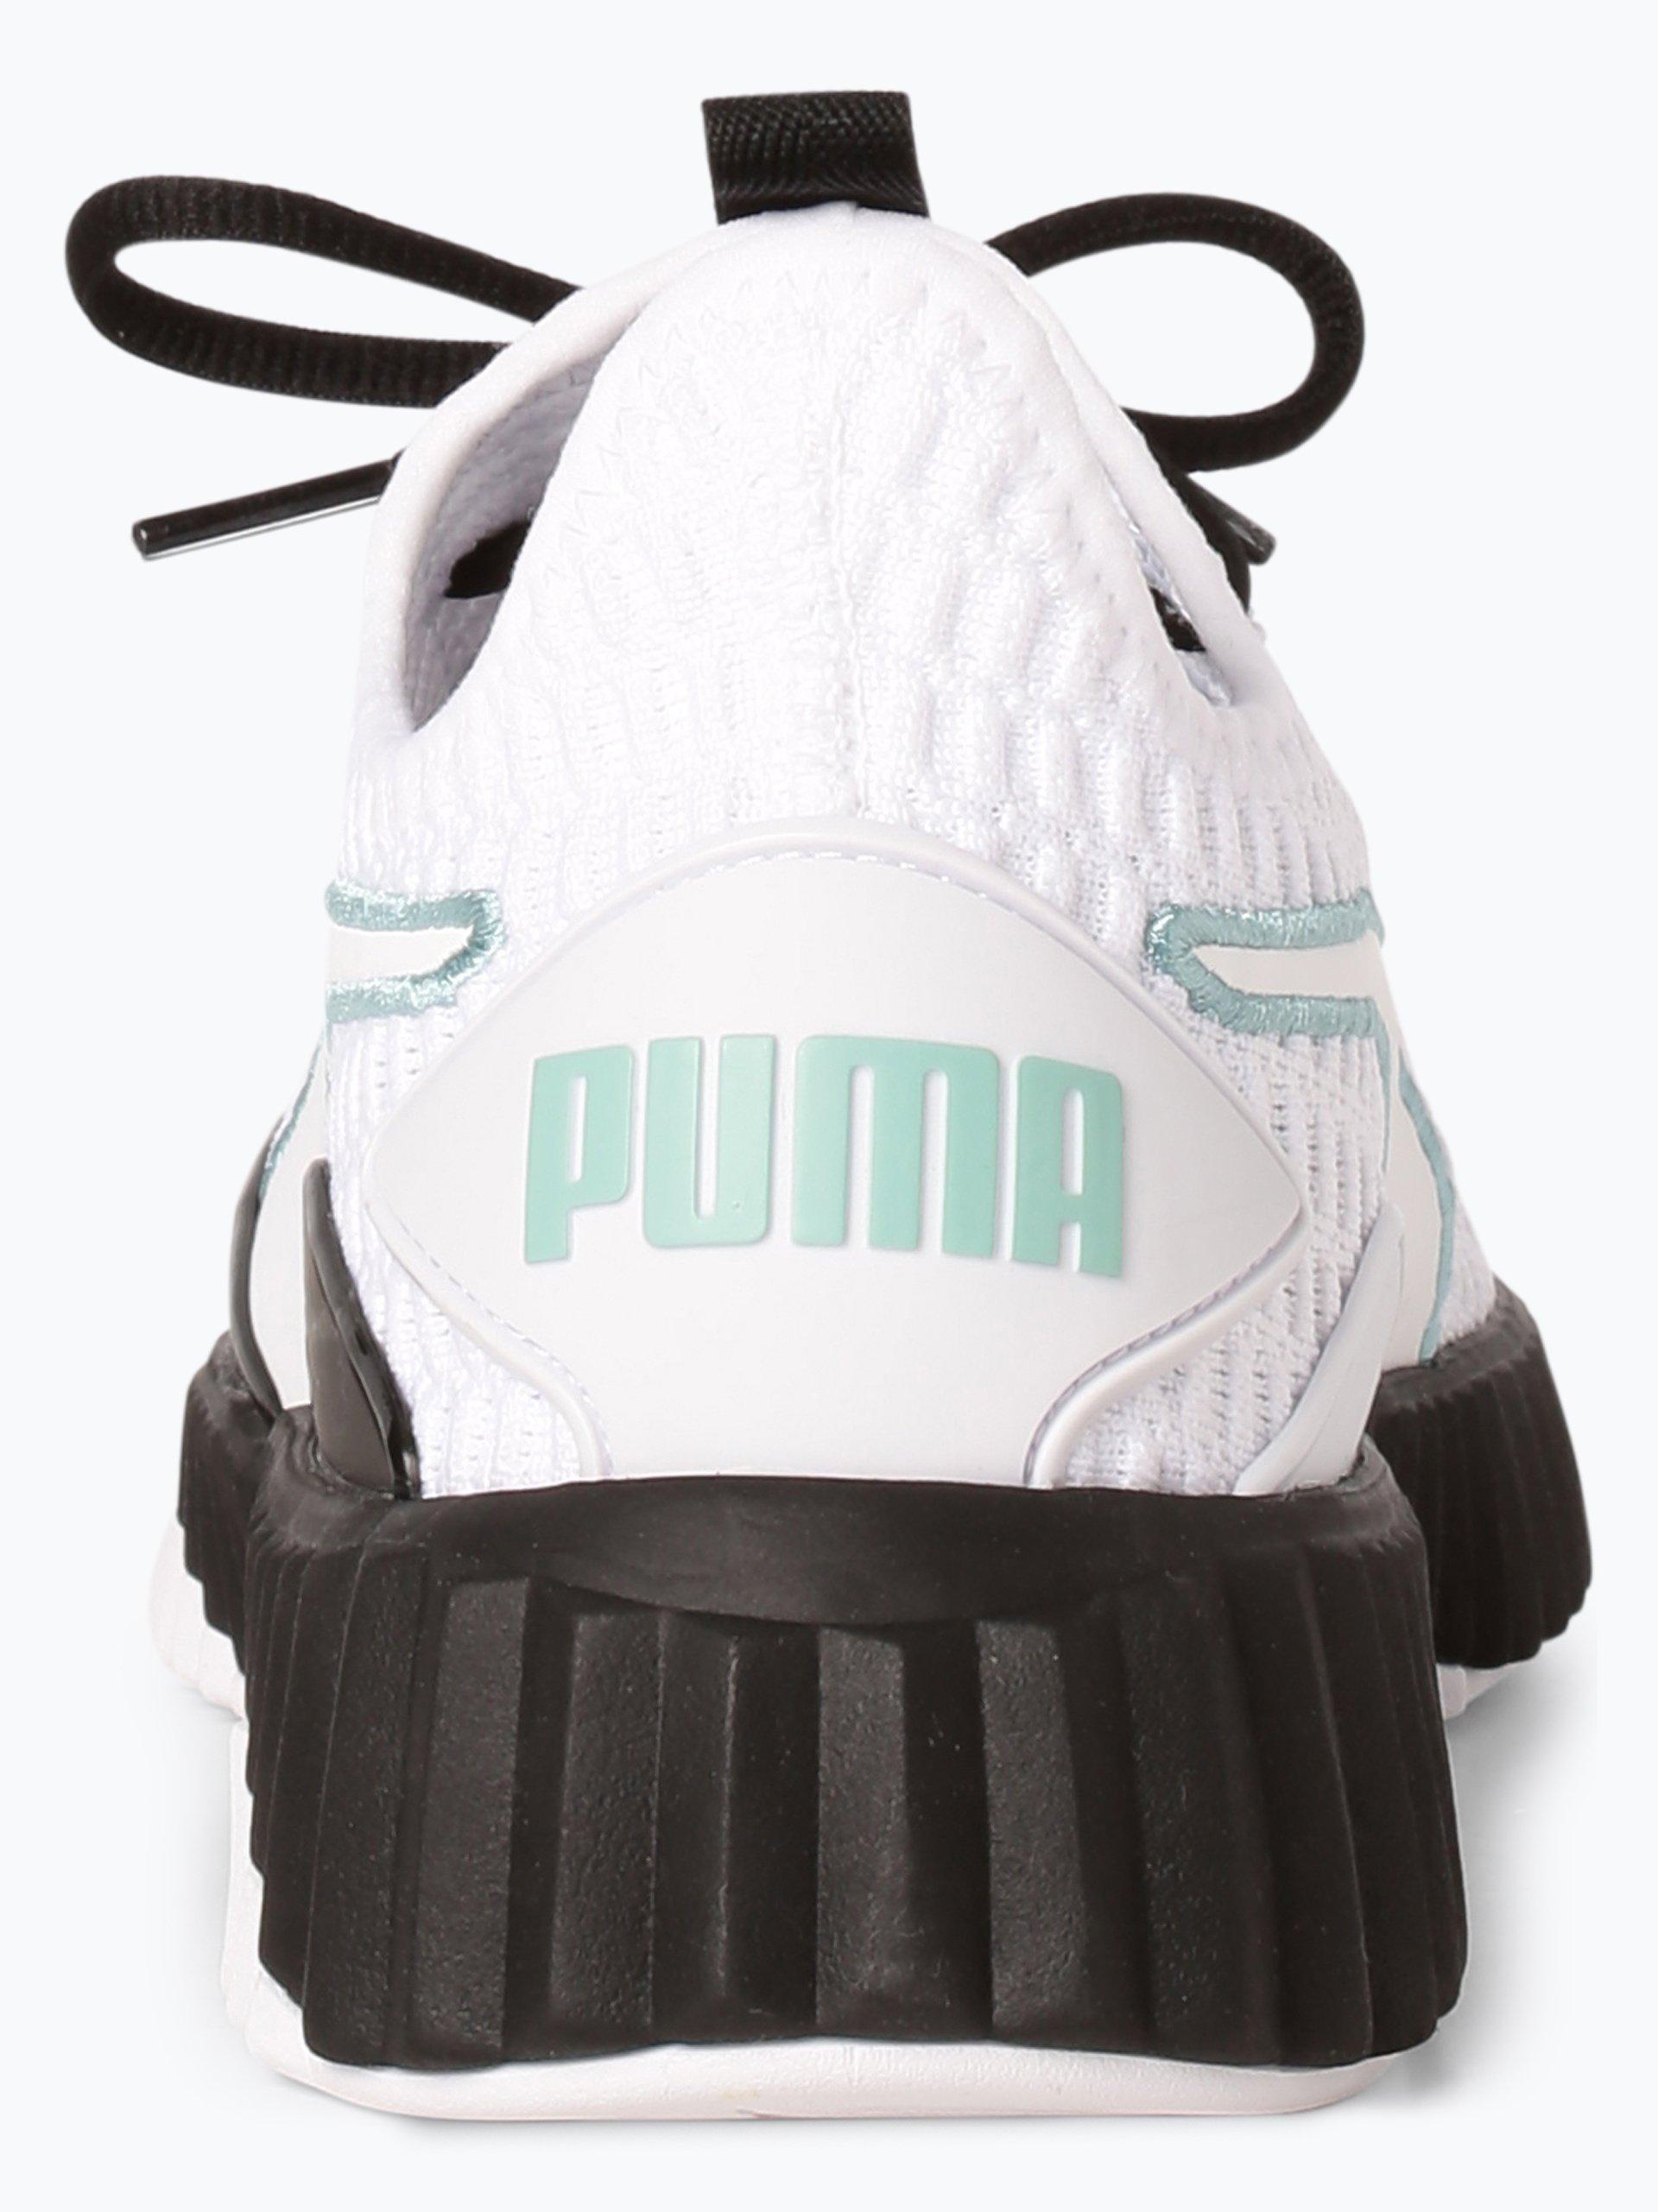 Puma Tenisówki damskie – Defy